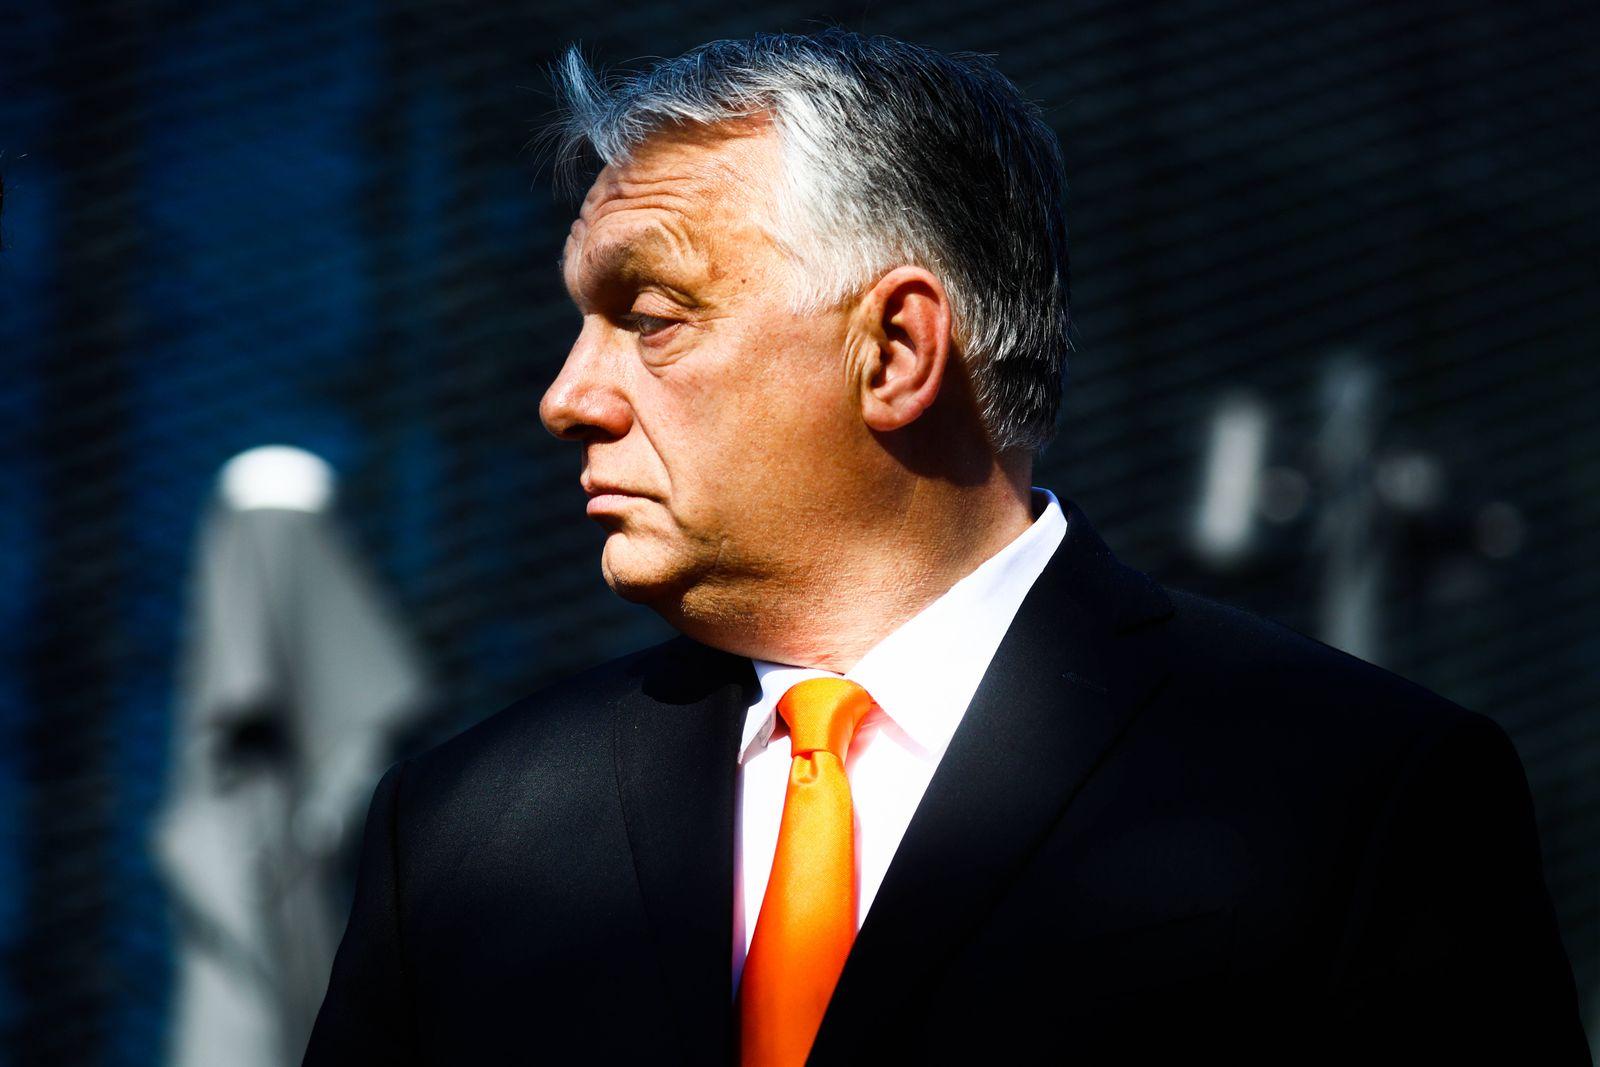 Viktor Orban At V4 Presidency Summit In Poland Viktor Orban, the Prime Minister of Hungary, is photographed during the V